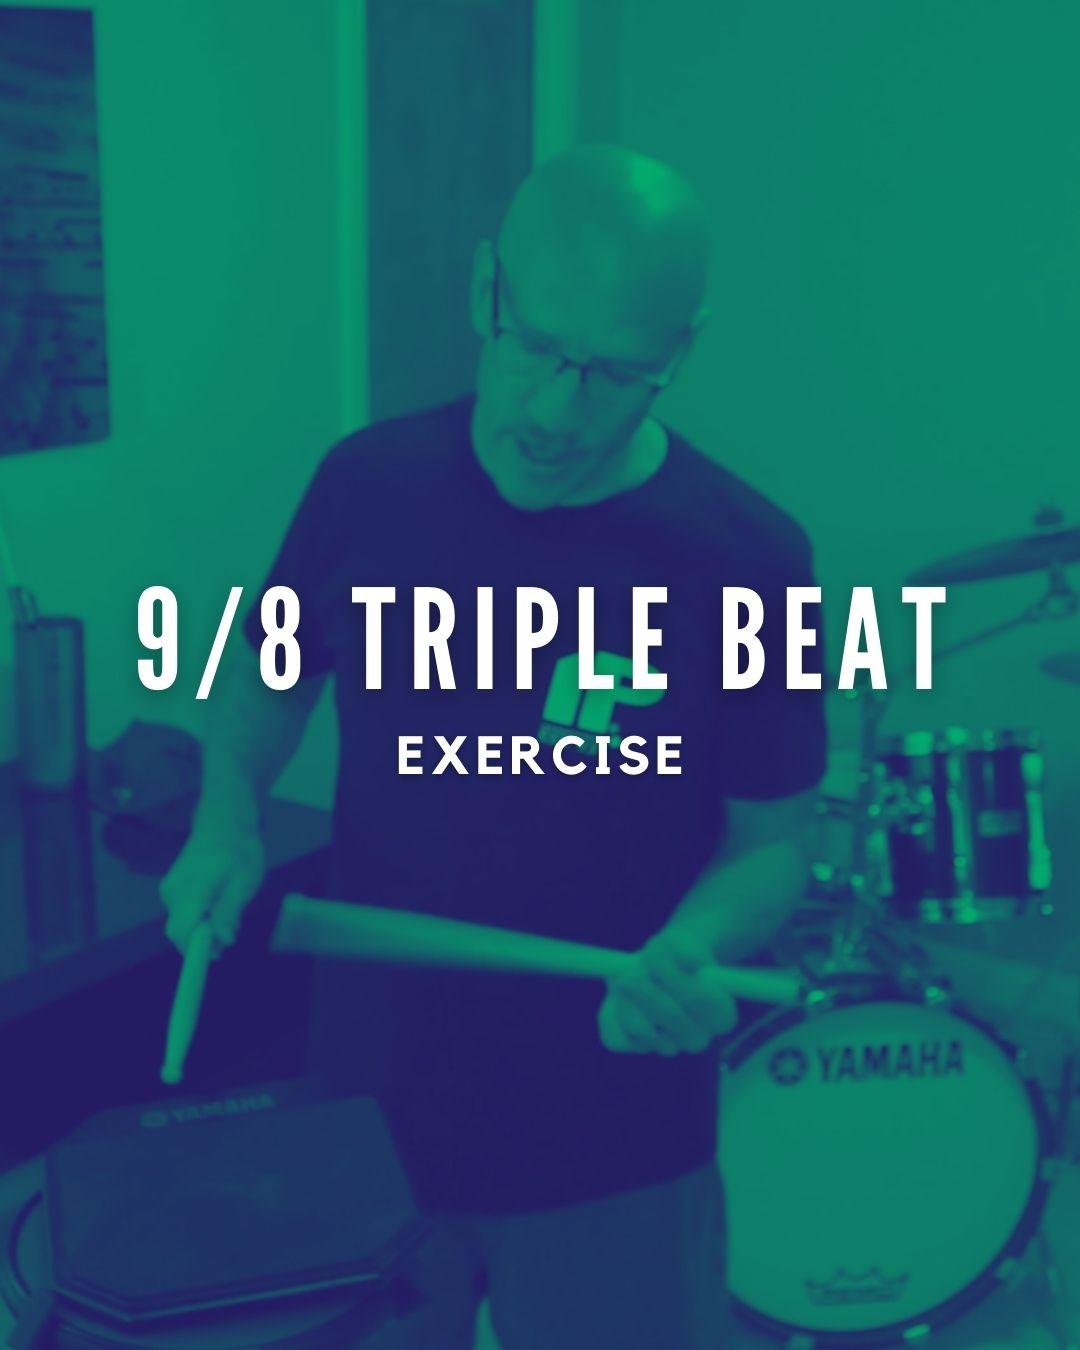 9/8 Triple Beat